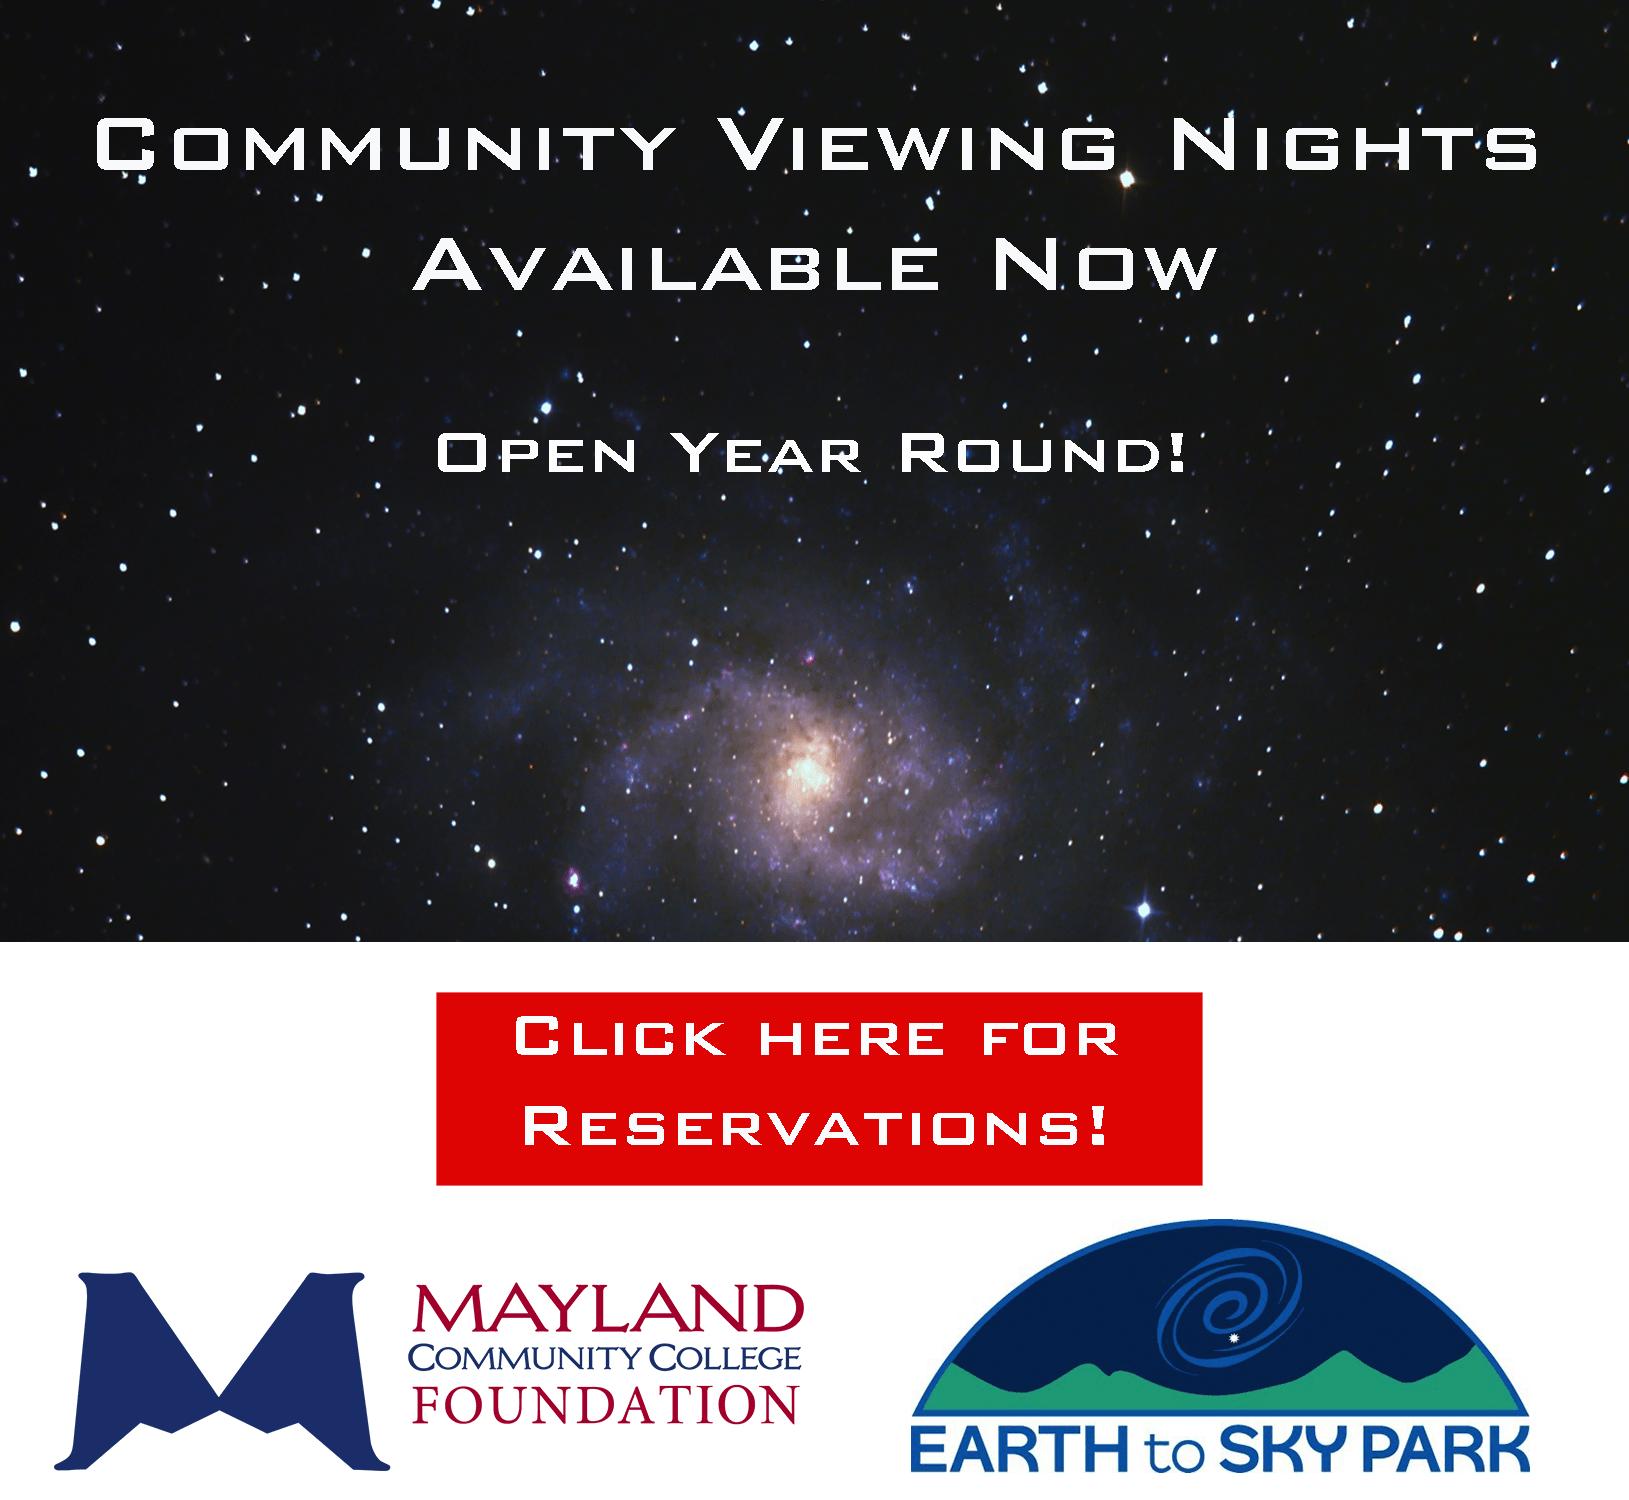 Community Viewing Nights Marketing Slide